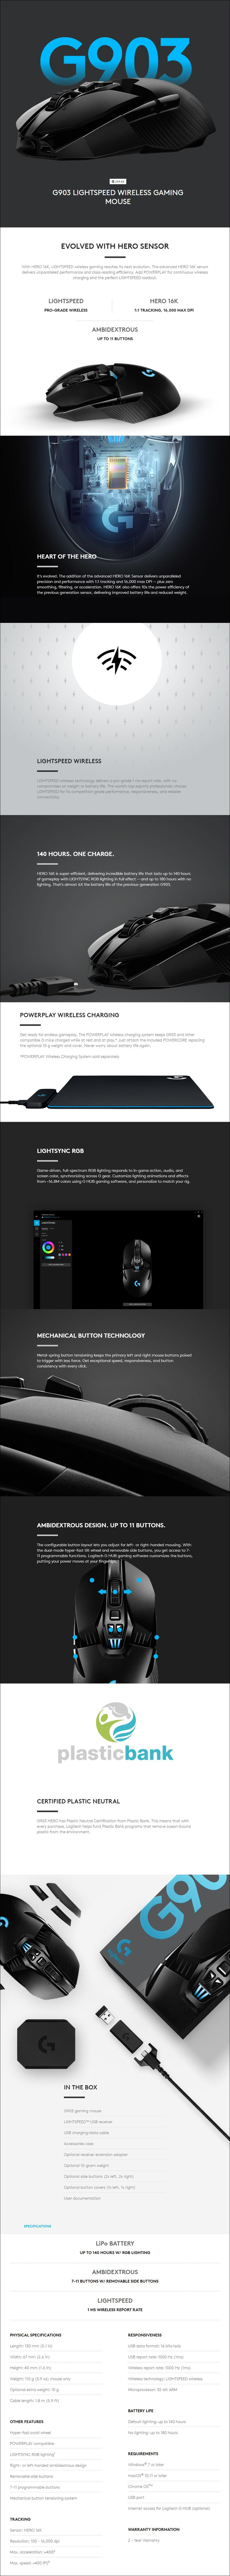 logitech-g903-hero-lightspeed-wireless-gaming-mouse-ac26723-7.jpg